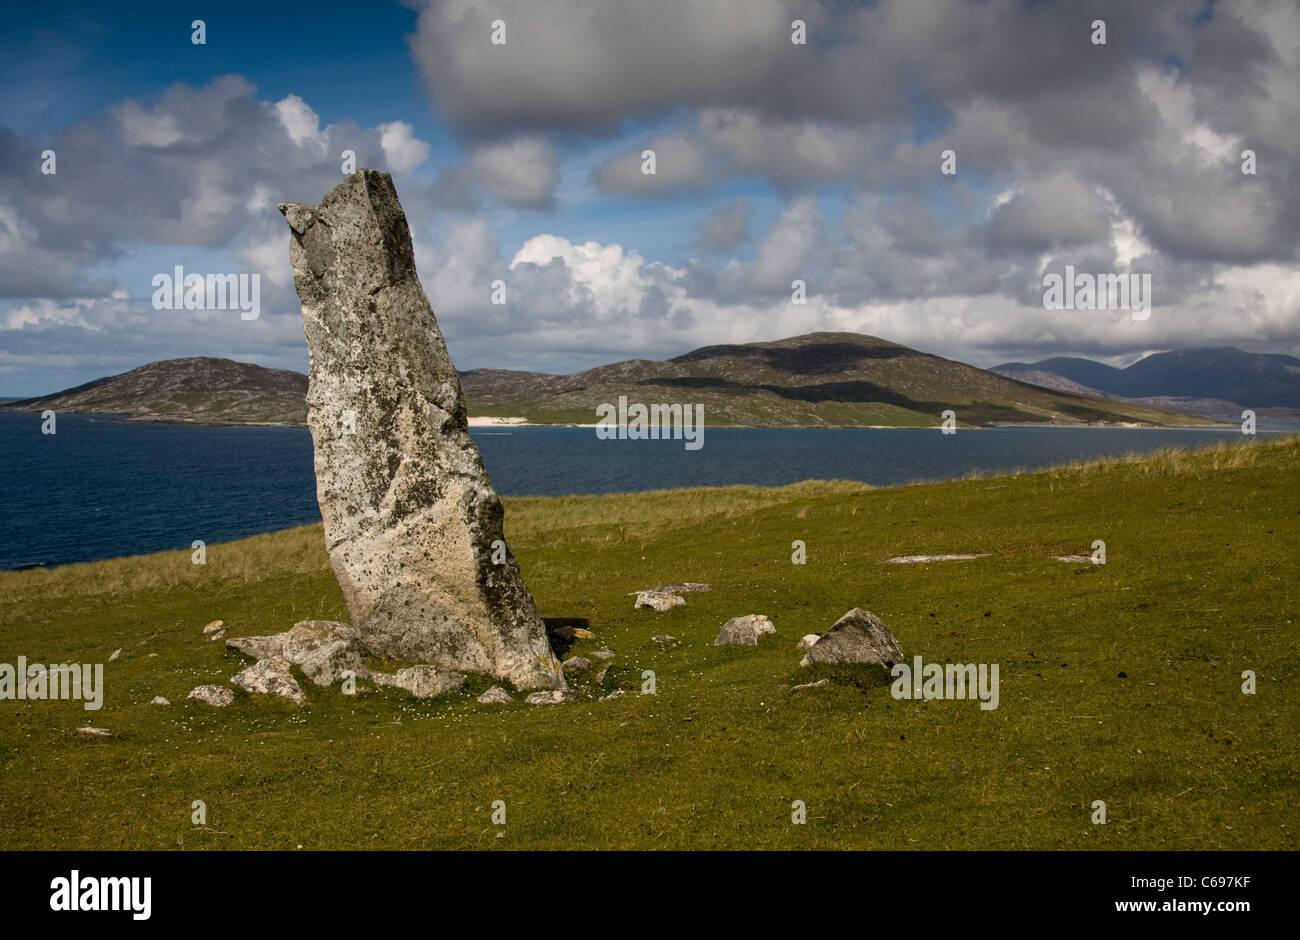 MacLeod's Stone at Nisabost, looking towards the Isle of Taransay, Harris, The Hebrides, Scotland - Stock Image